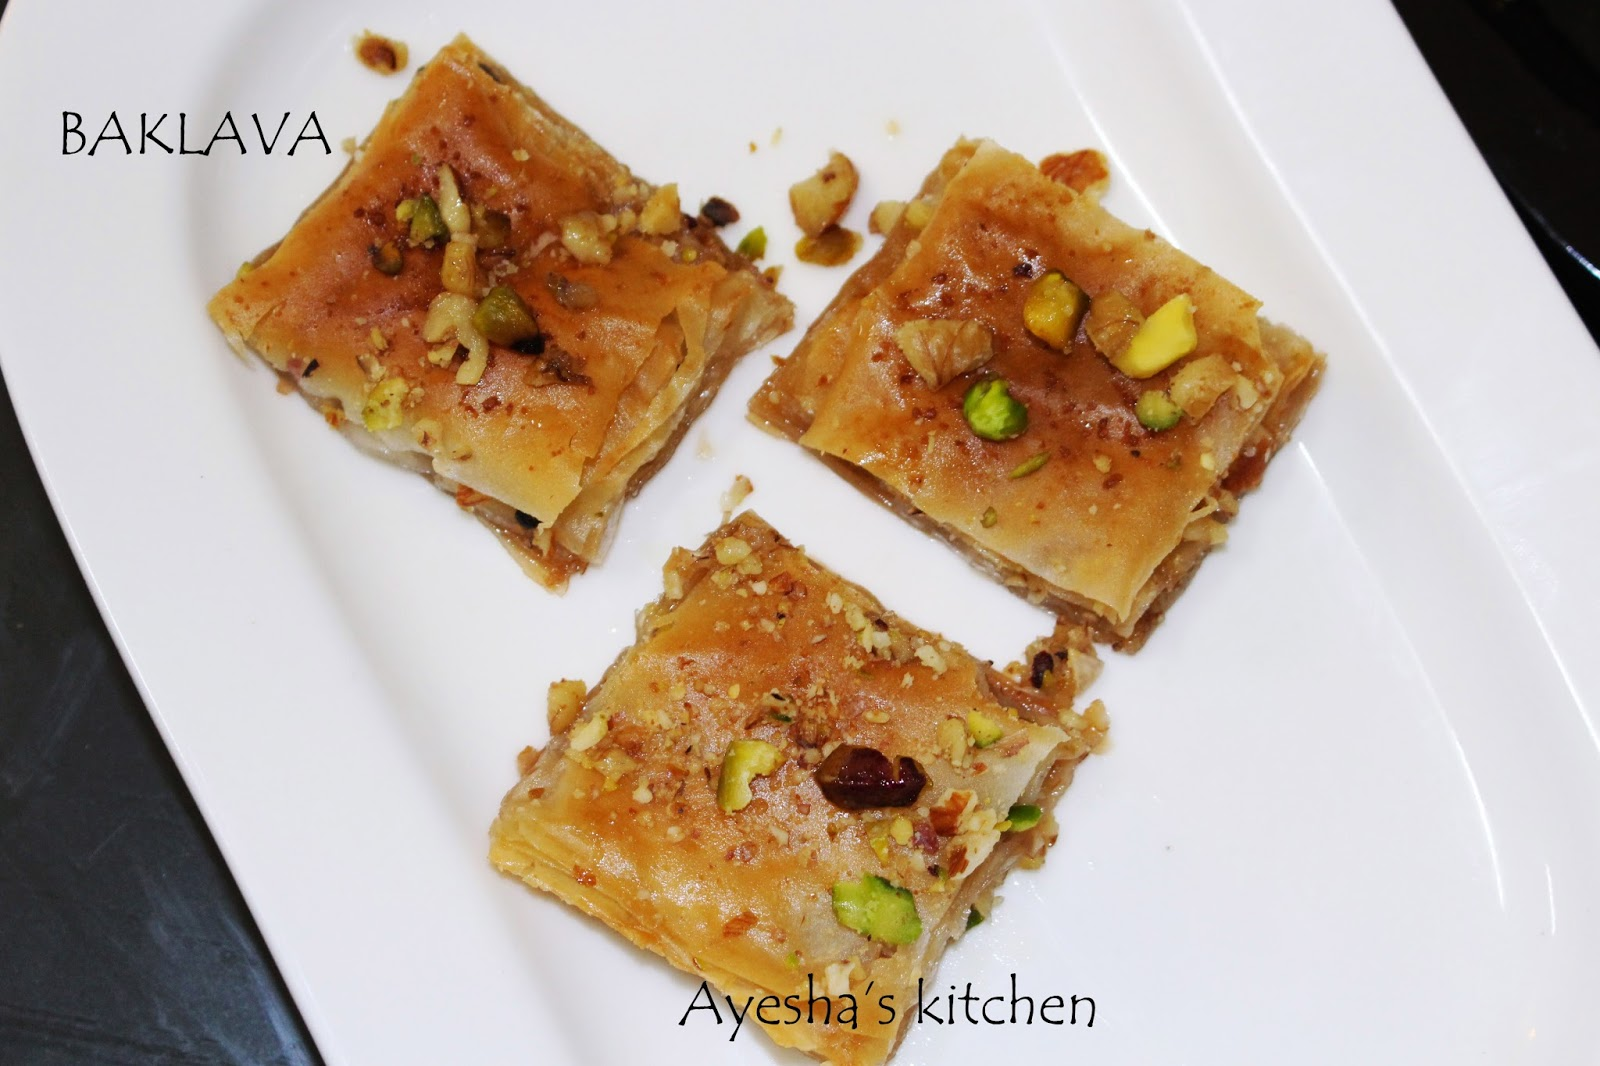 BAKLAVA RECIPE- HOW TO MAKE MIXED NUTS BAKLAVA / TURKISH BAKLAVA